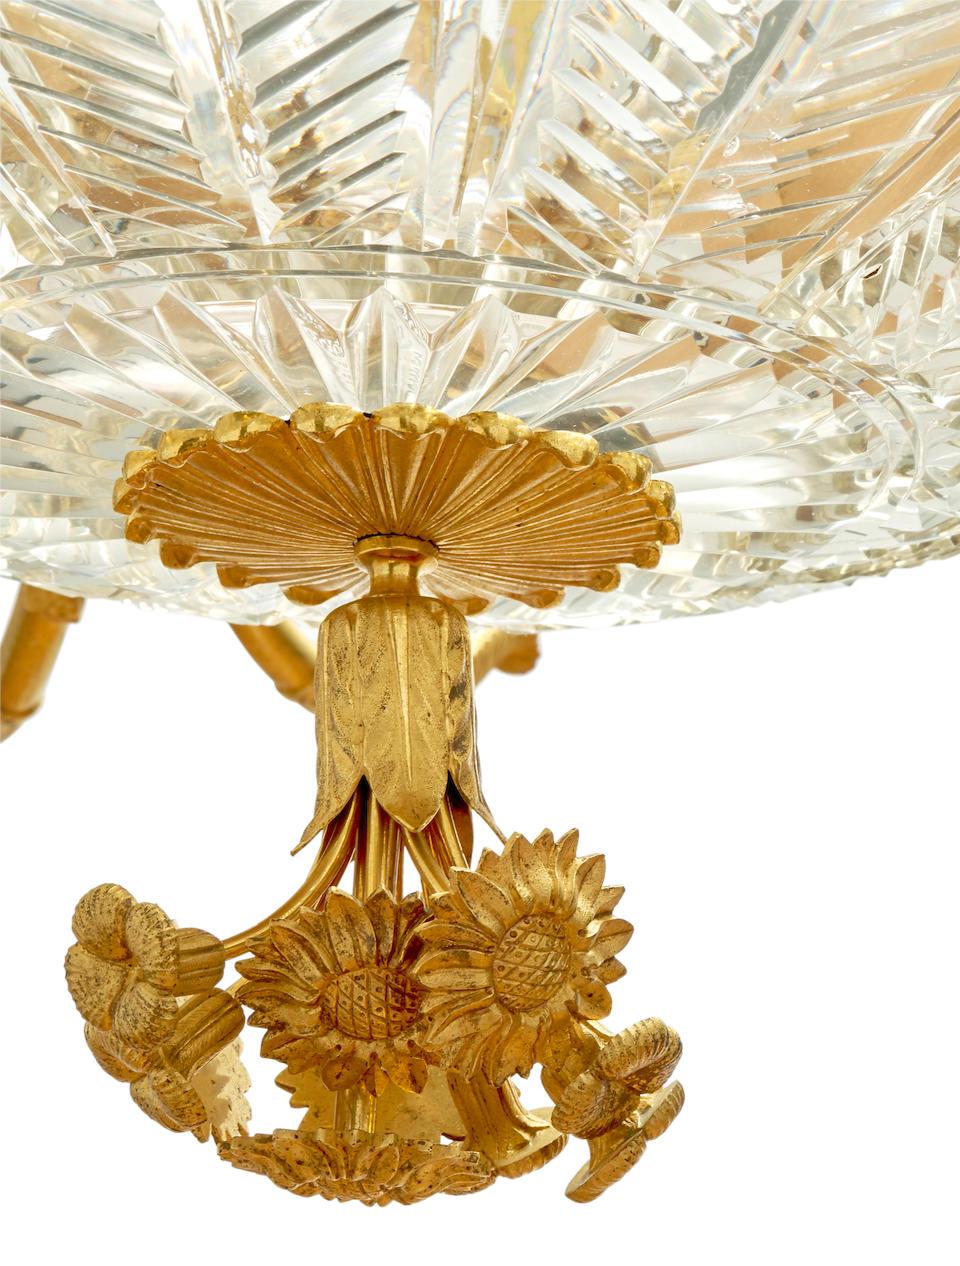 A fine ormolu and cut-glass twenty-light chandelierRussia, probably St. Petersburg, c. 1820